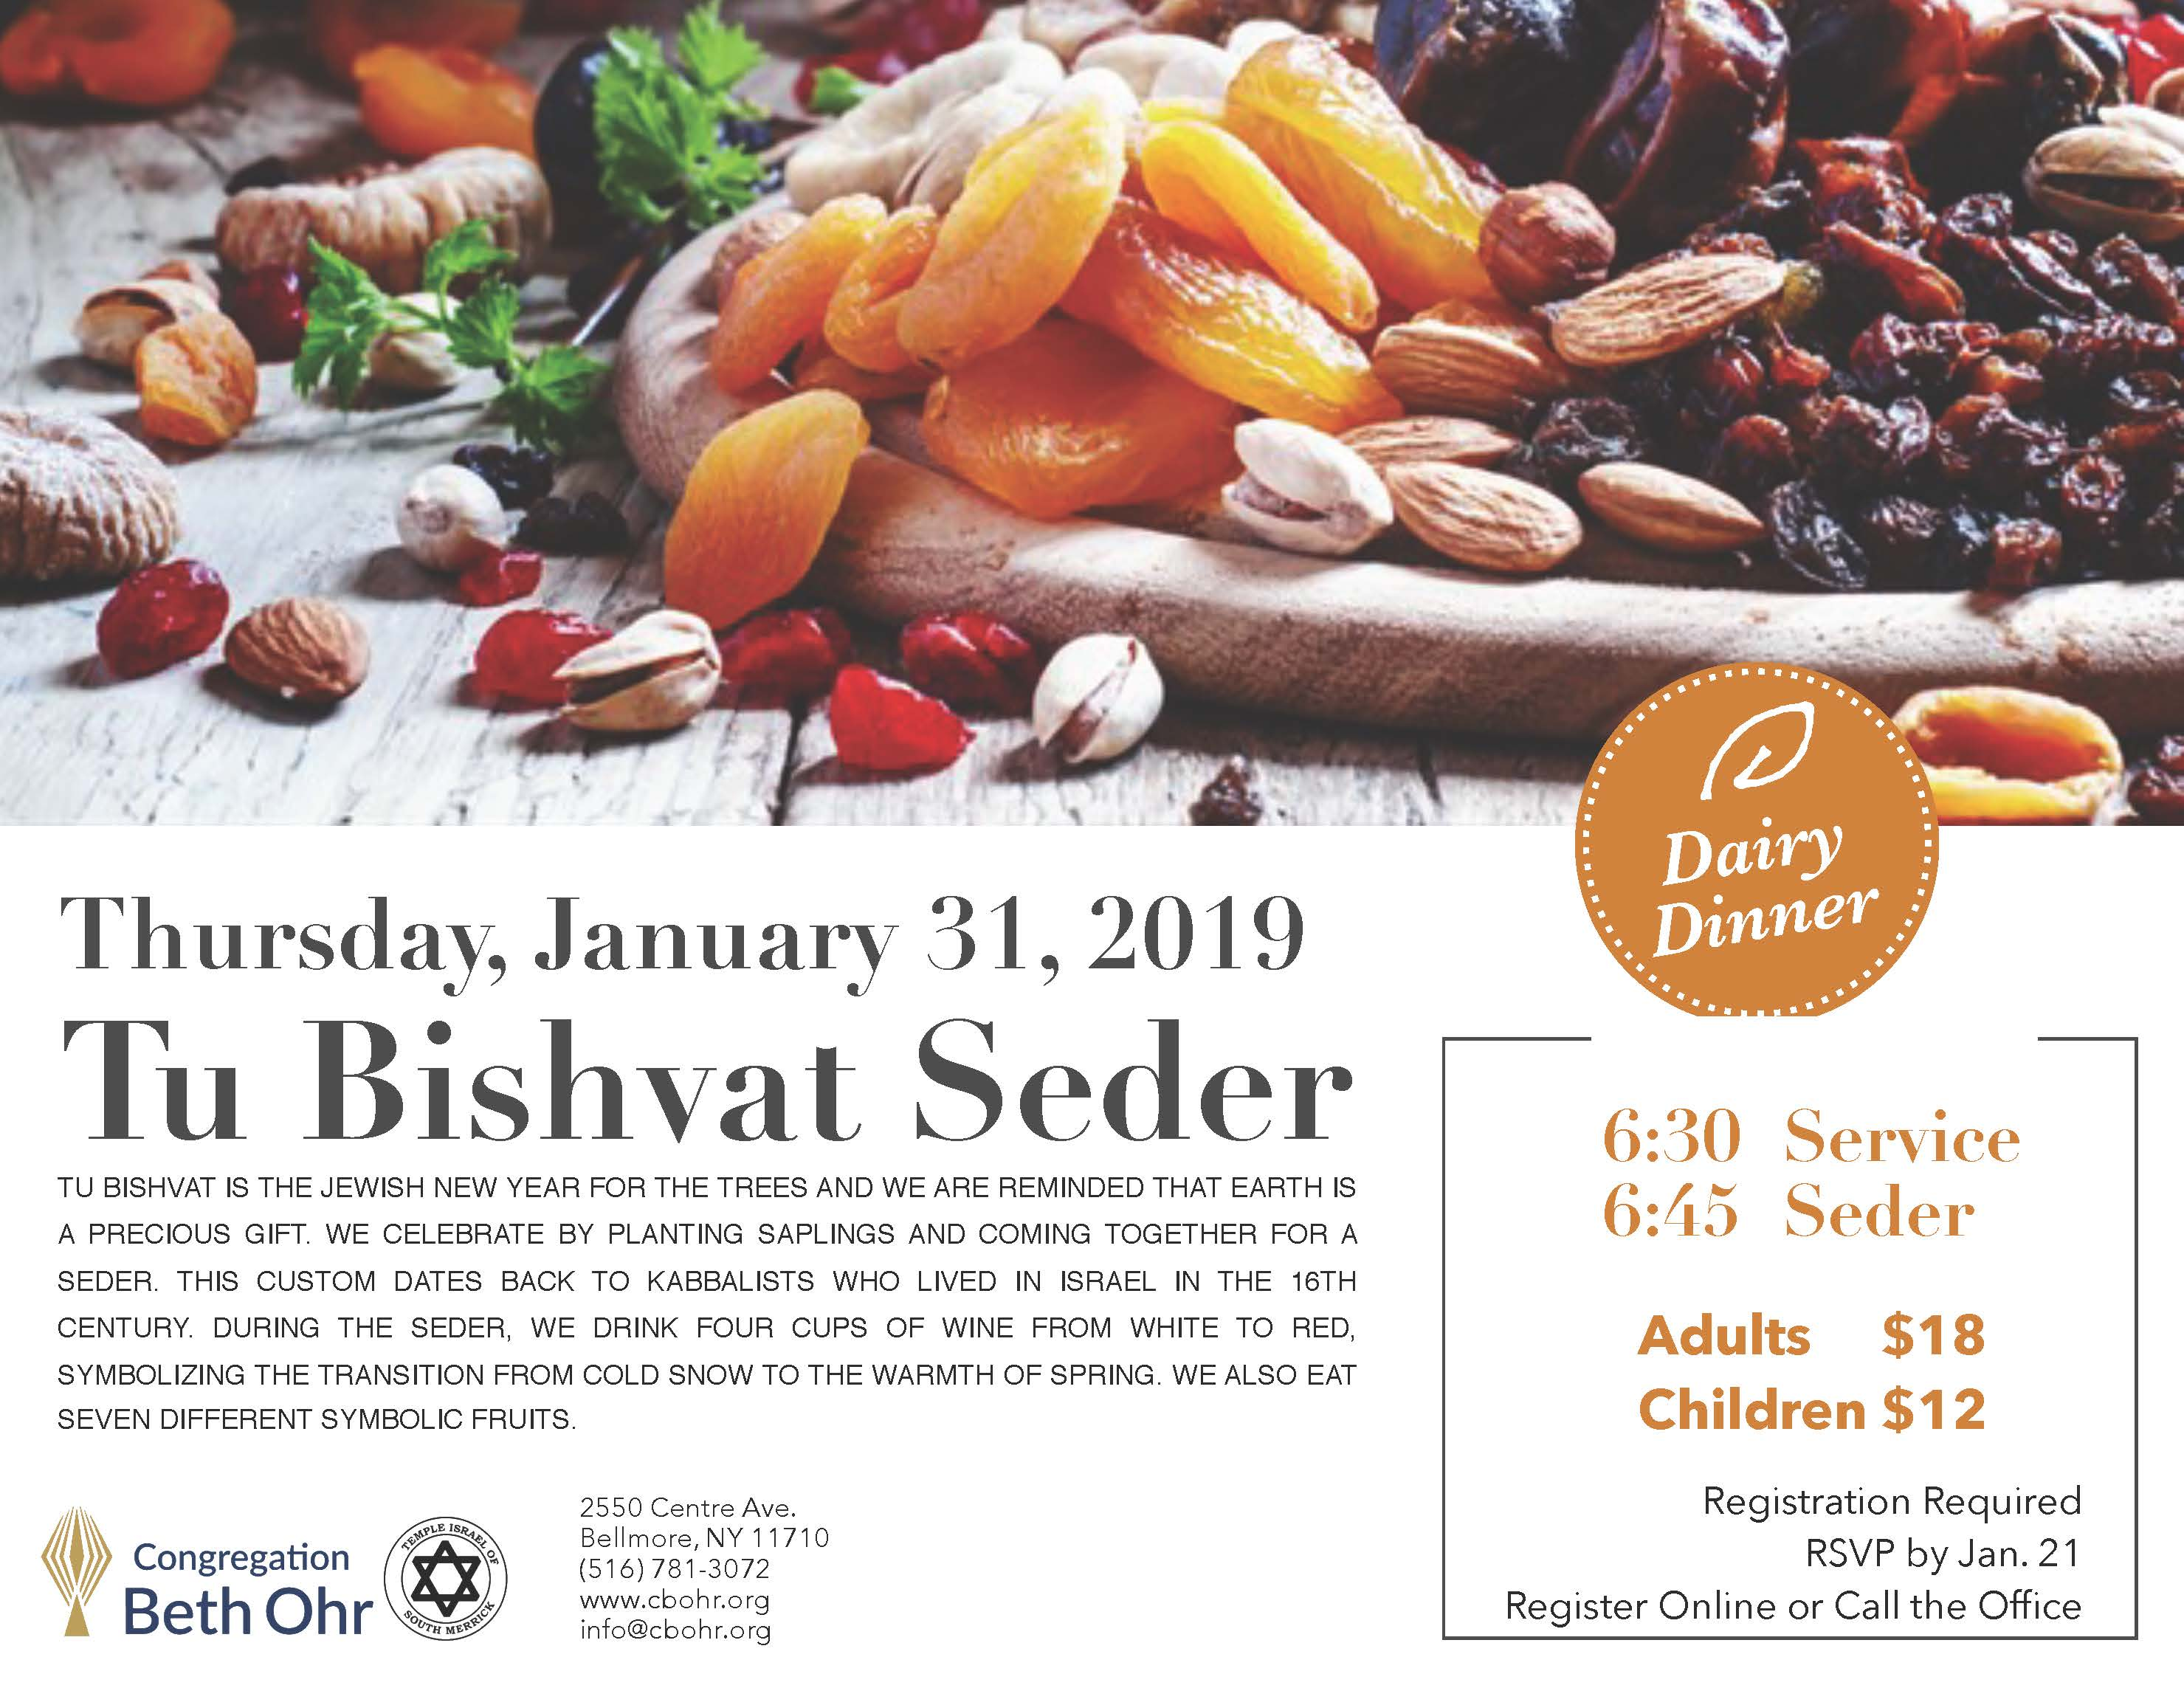 Tu Bishvat Service and Seder